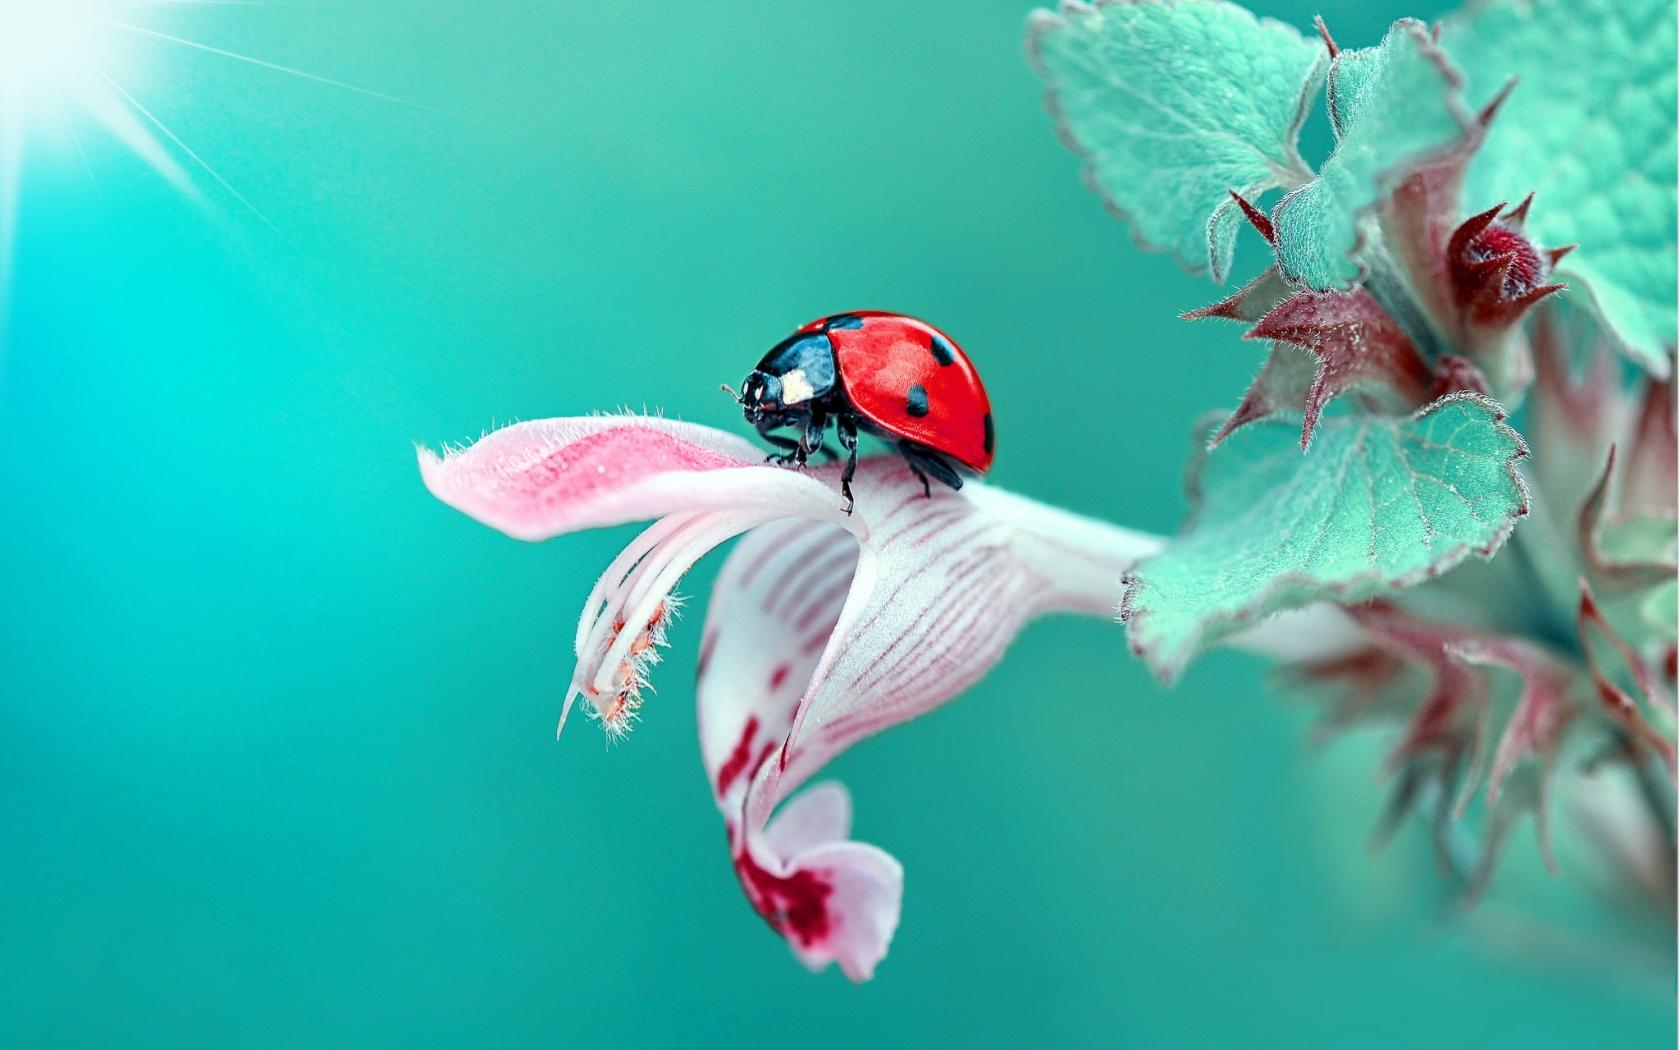 8k Animal Wallpaper Download: Insect Ladybug Macro, Full HD 2K Wallpaper